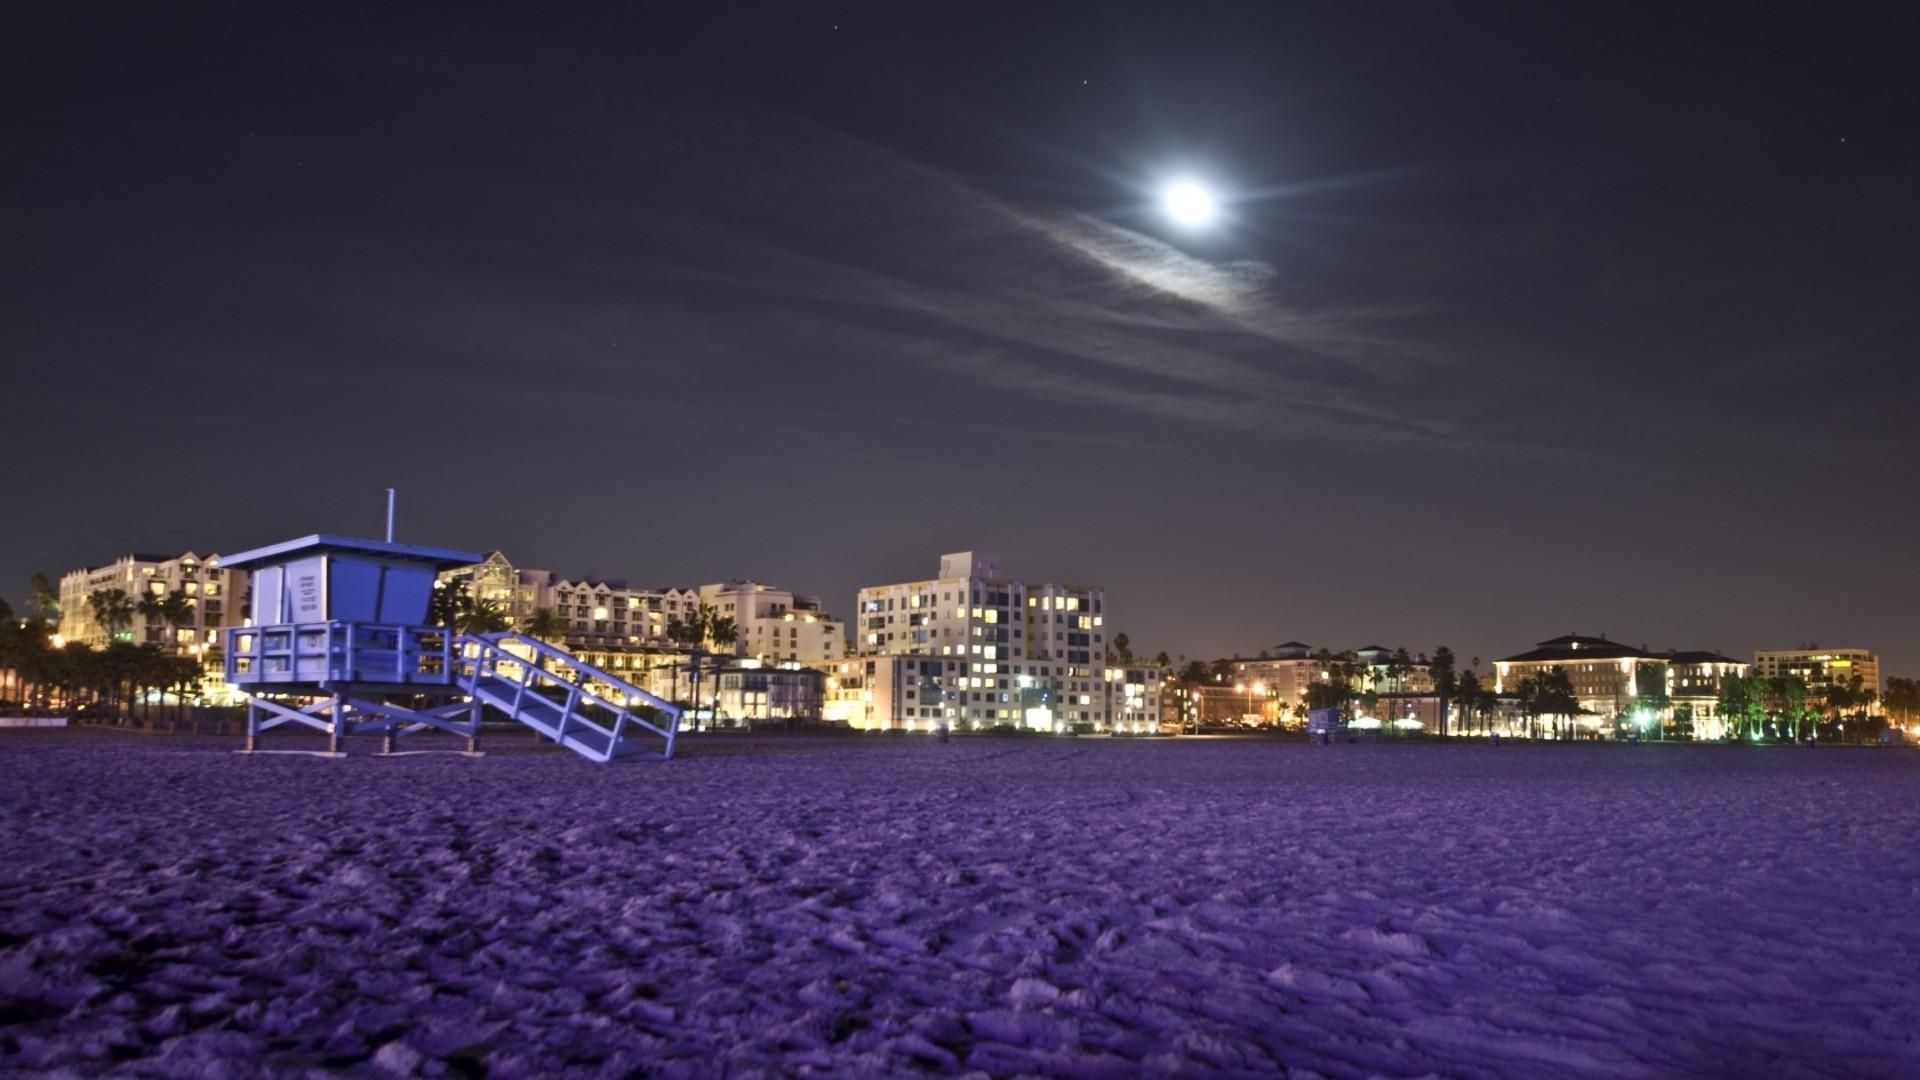 Moon Santa Monica Beach Purple Purplse City Night Lifeguard - California Night - HD Wallpaper